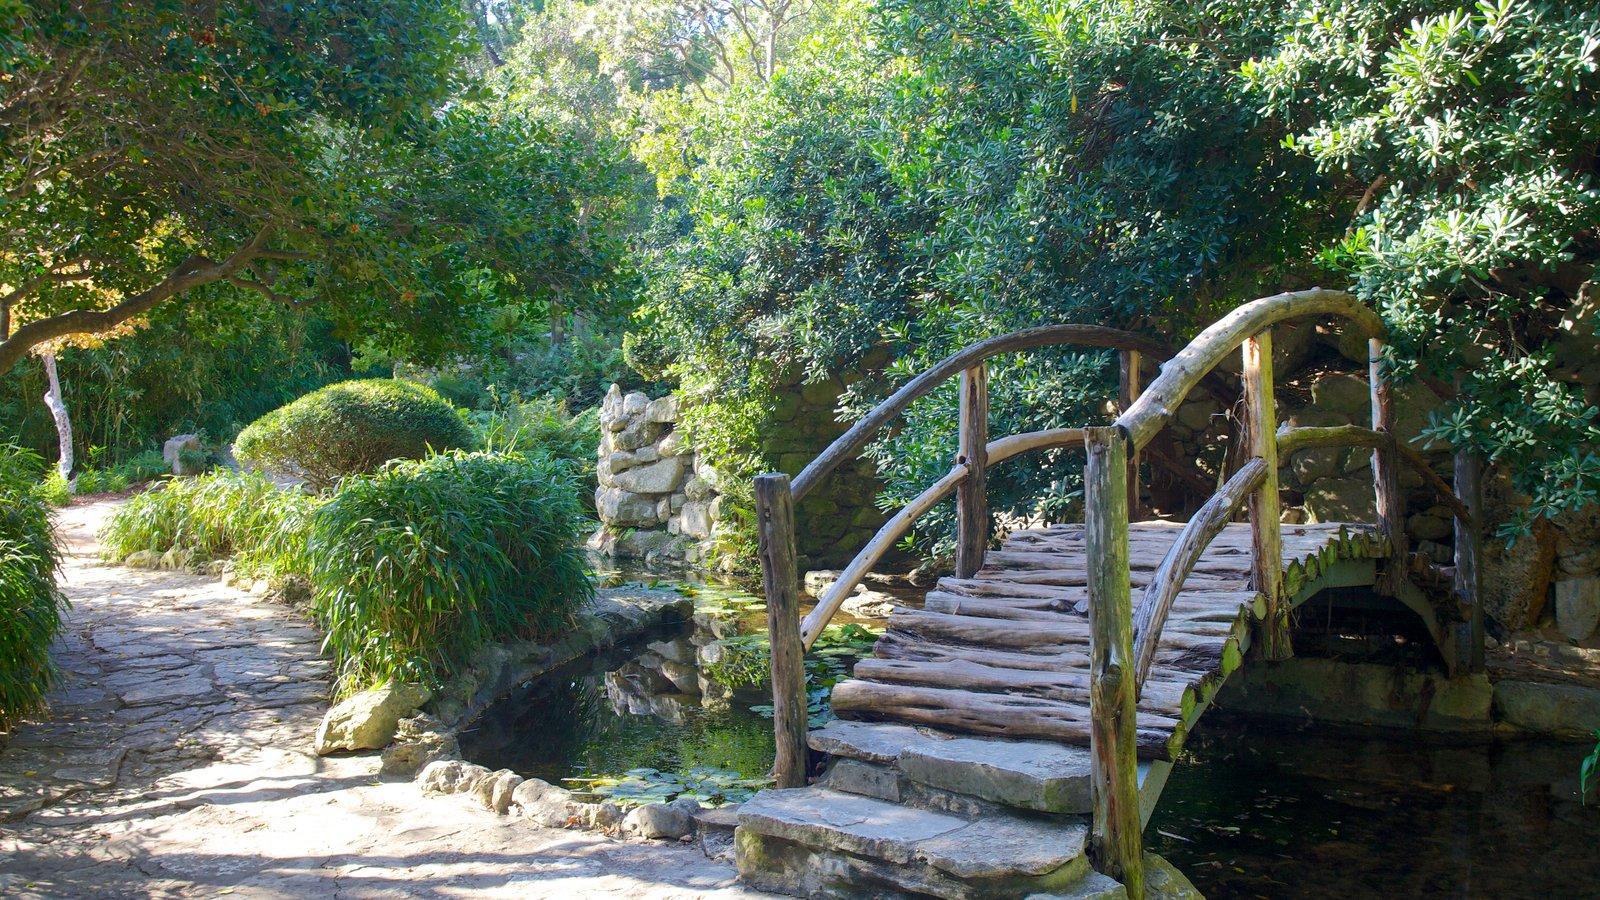 Austin which includes a garden, a bridge and a pond